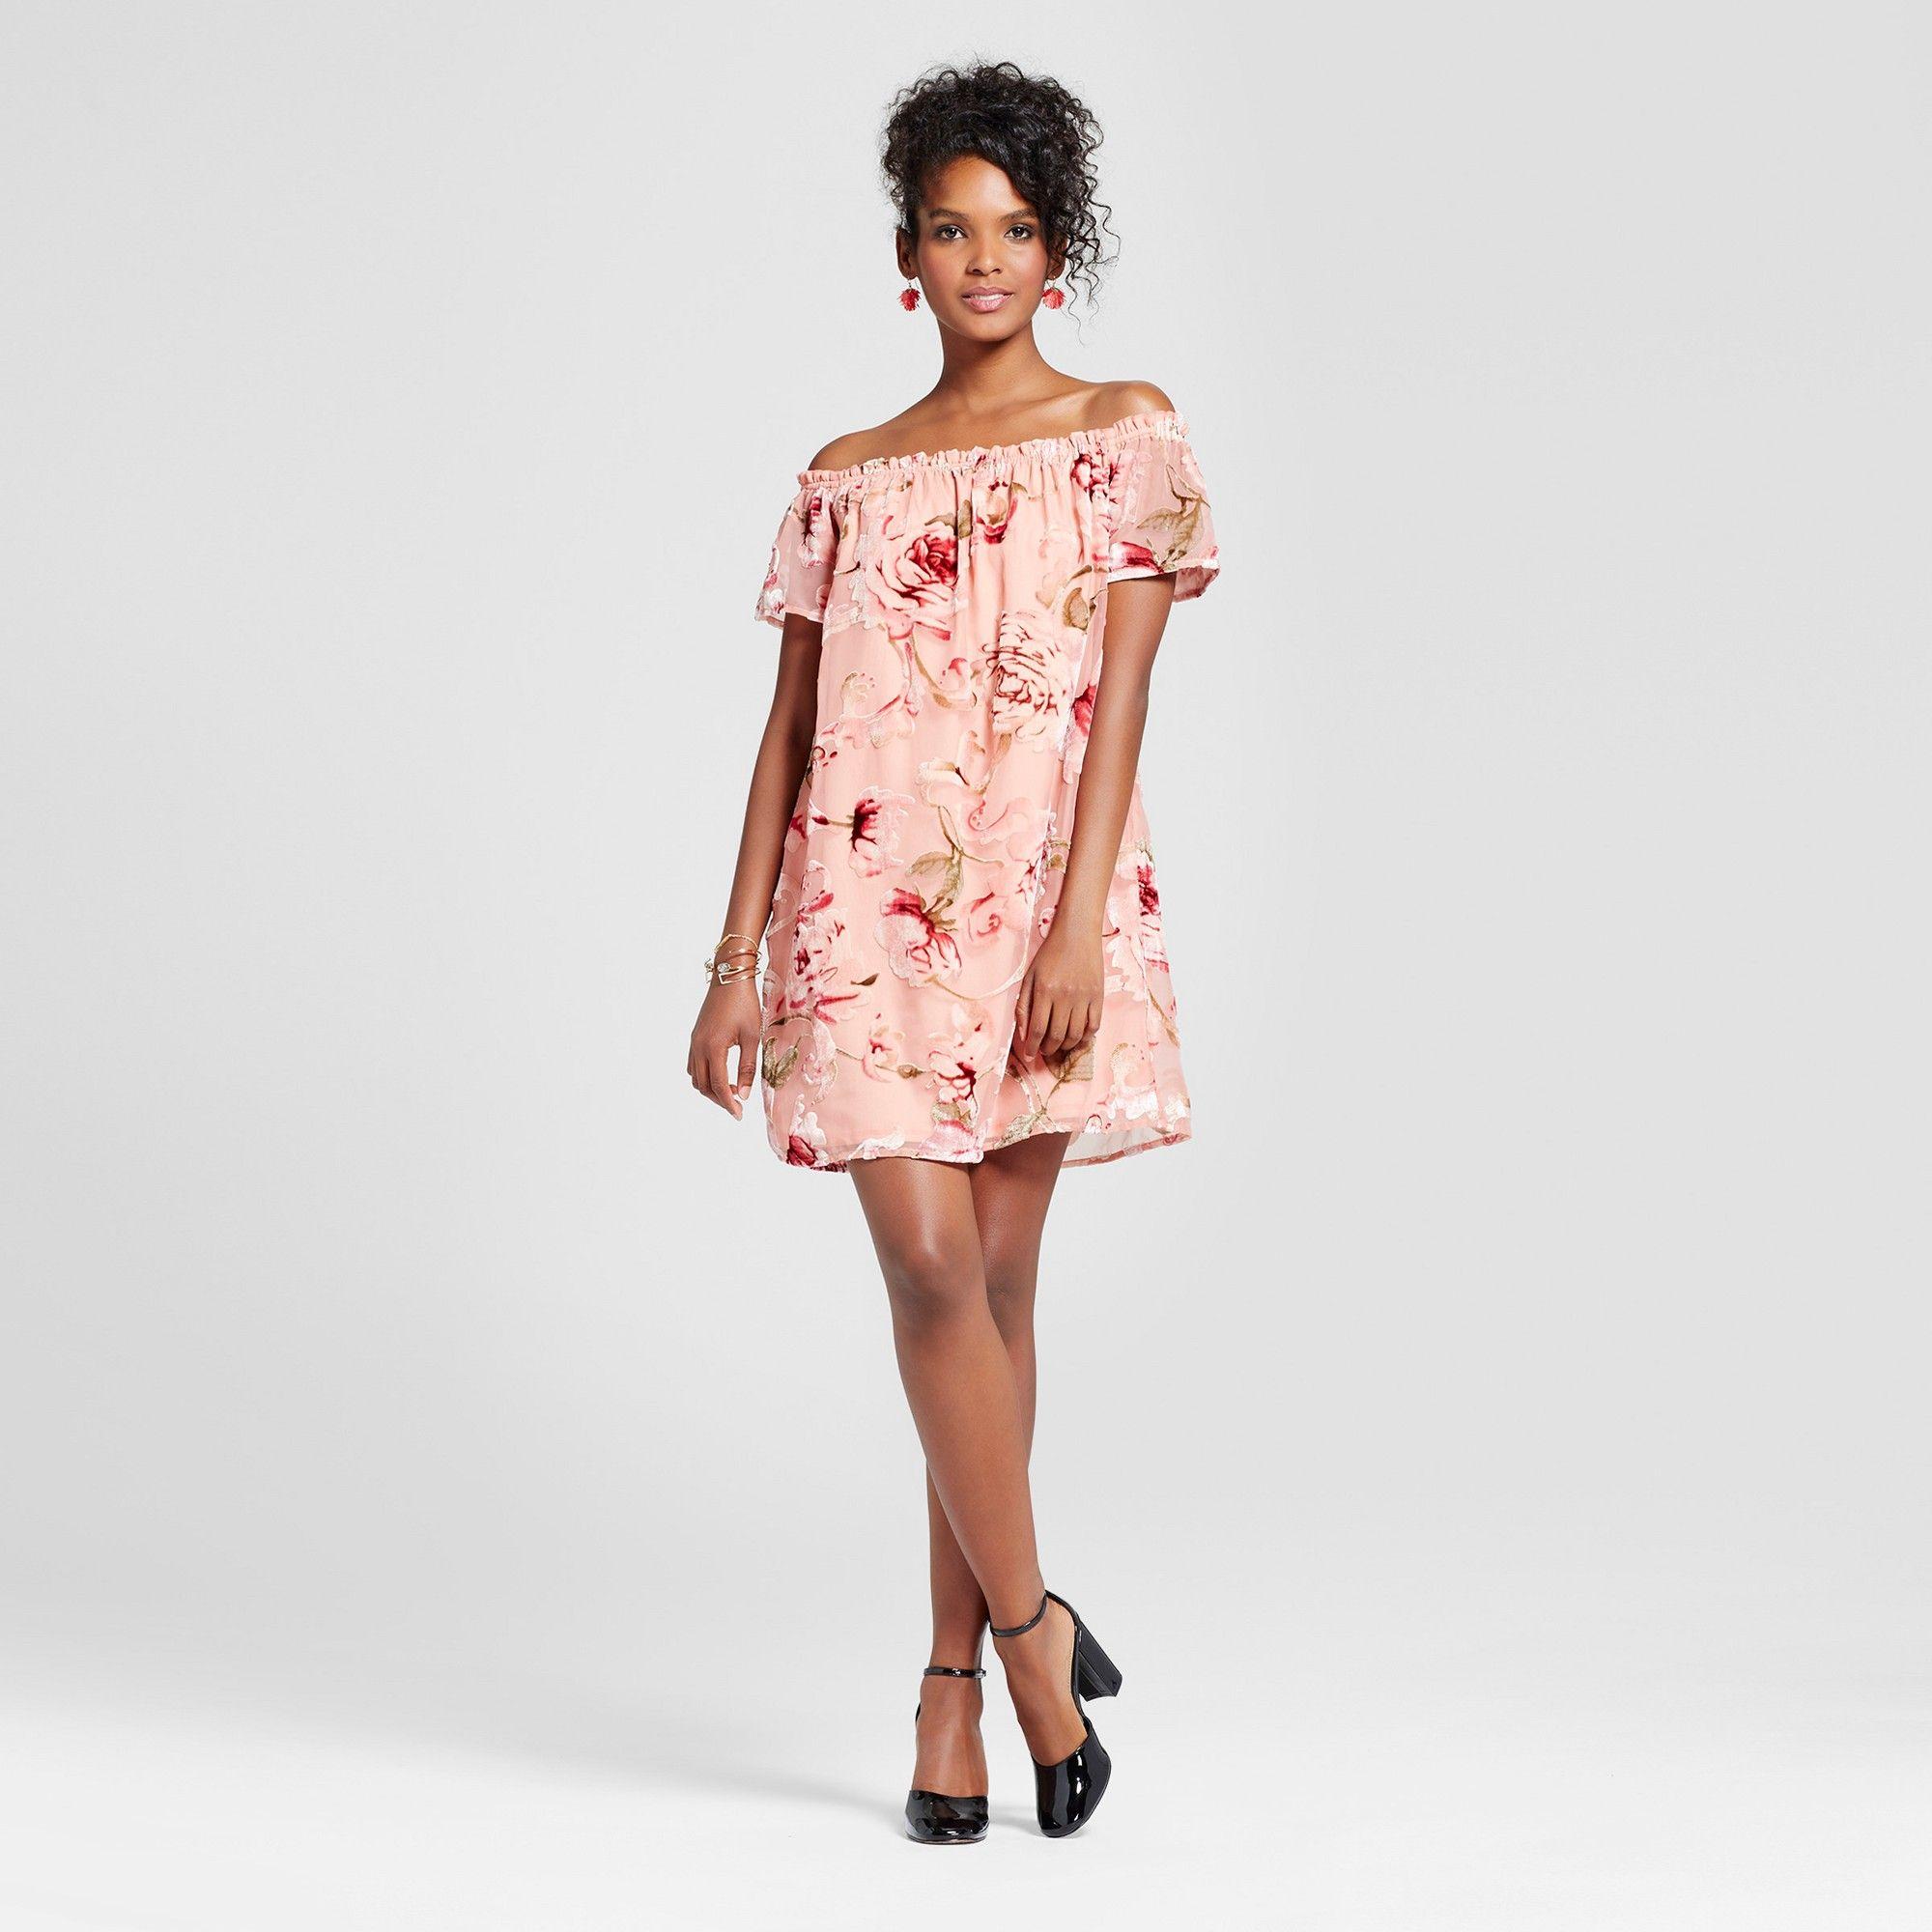 09ae7483ae09 Women's Velvet Burnout Off the Shoulder Dress - Xhilaration (Juniors') Pink  S